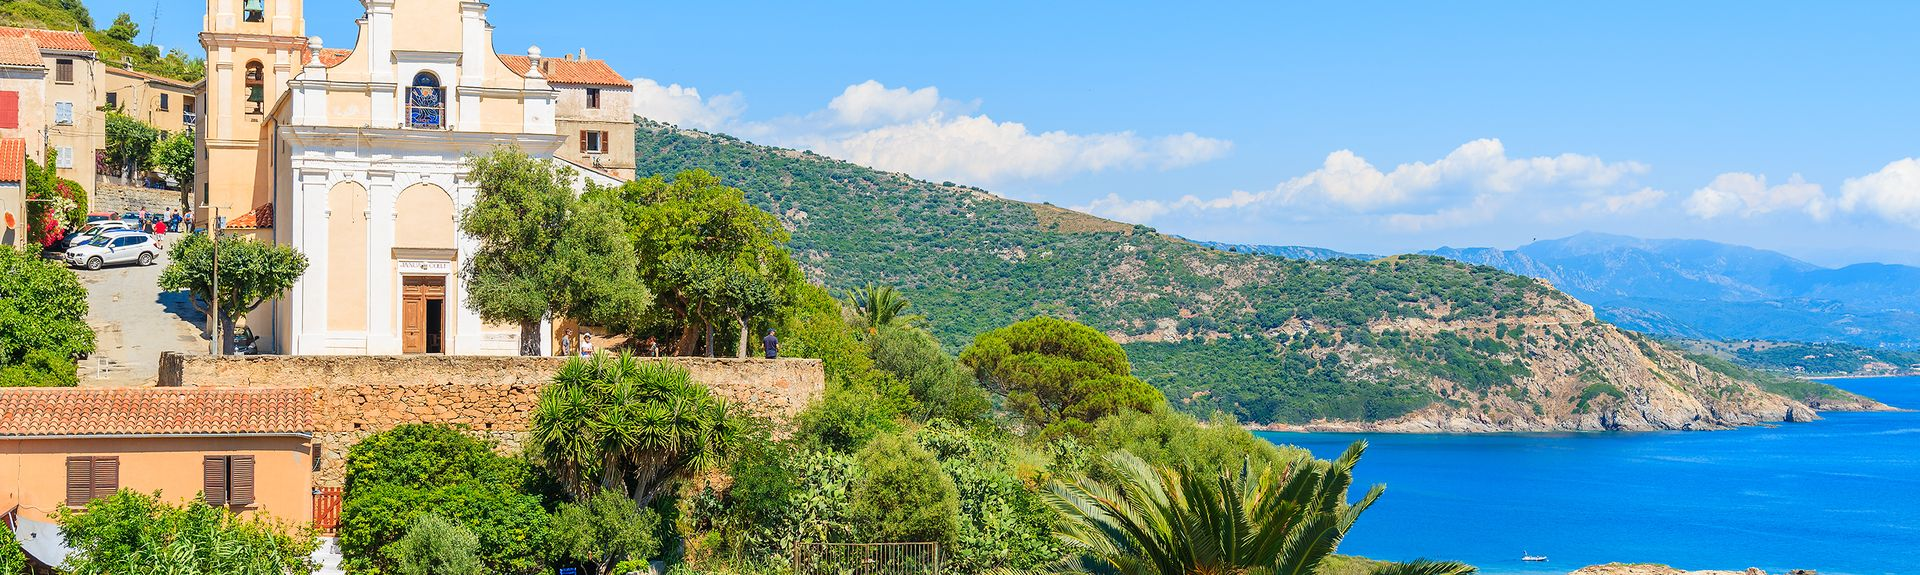 Cargèse, Korsika, Frankreich